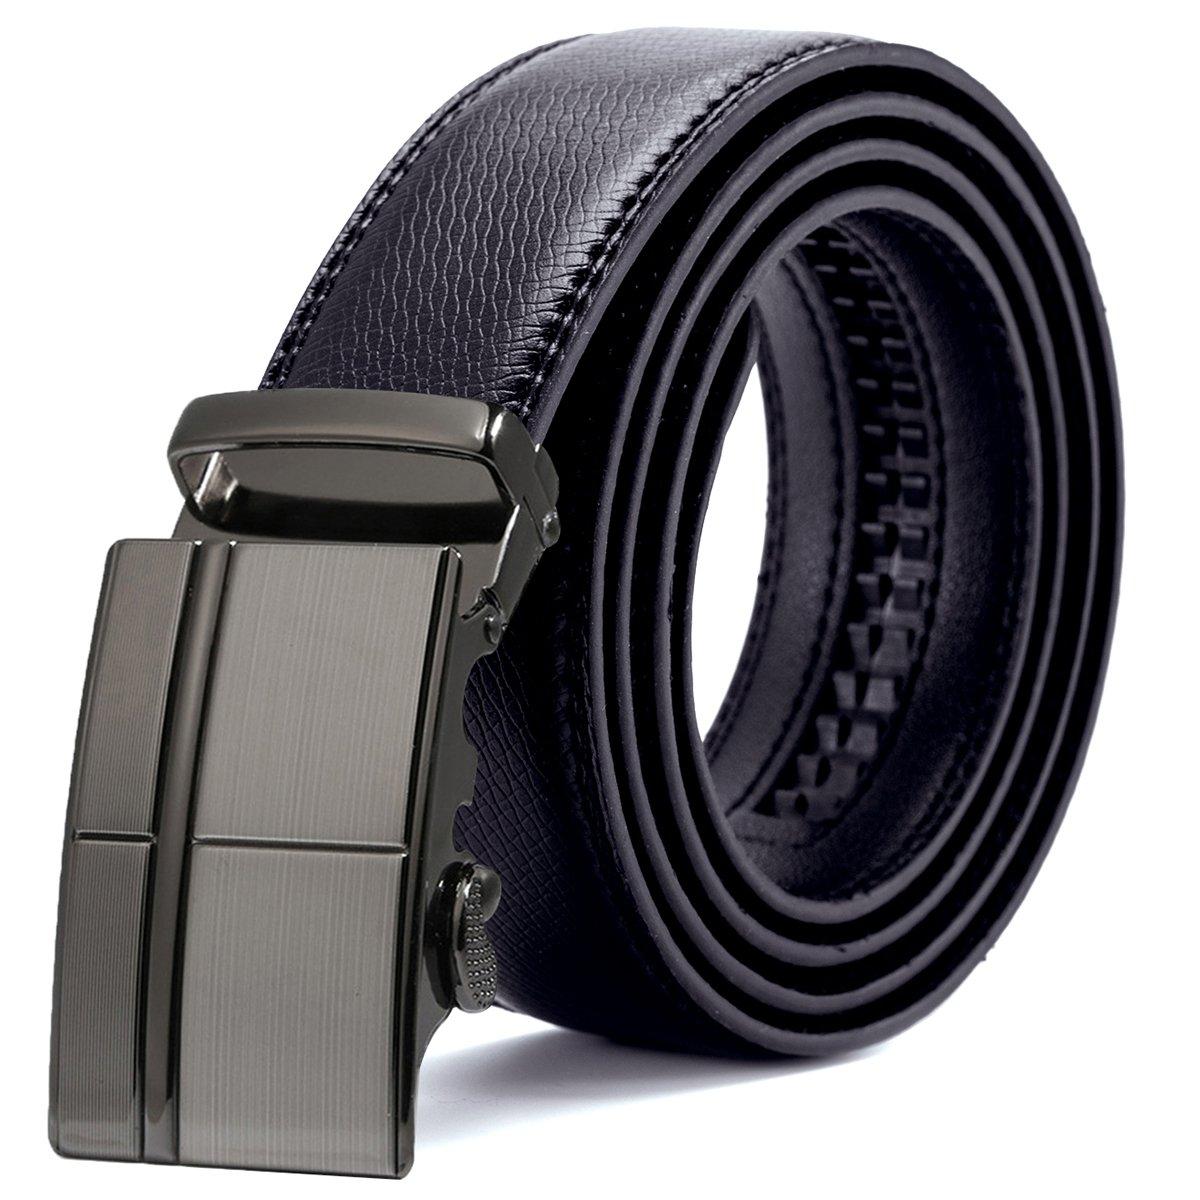 ITIEZY Ratchet Dress Belt For Men Click Belt Wide 1 3/8 with Automatic Buckle